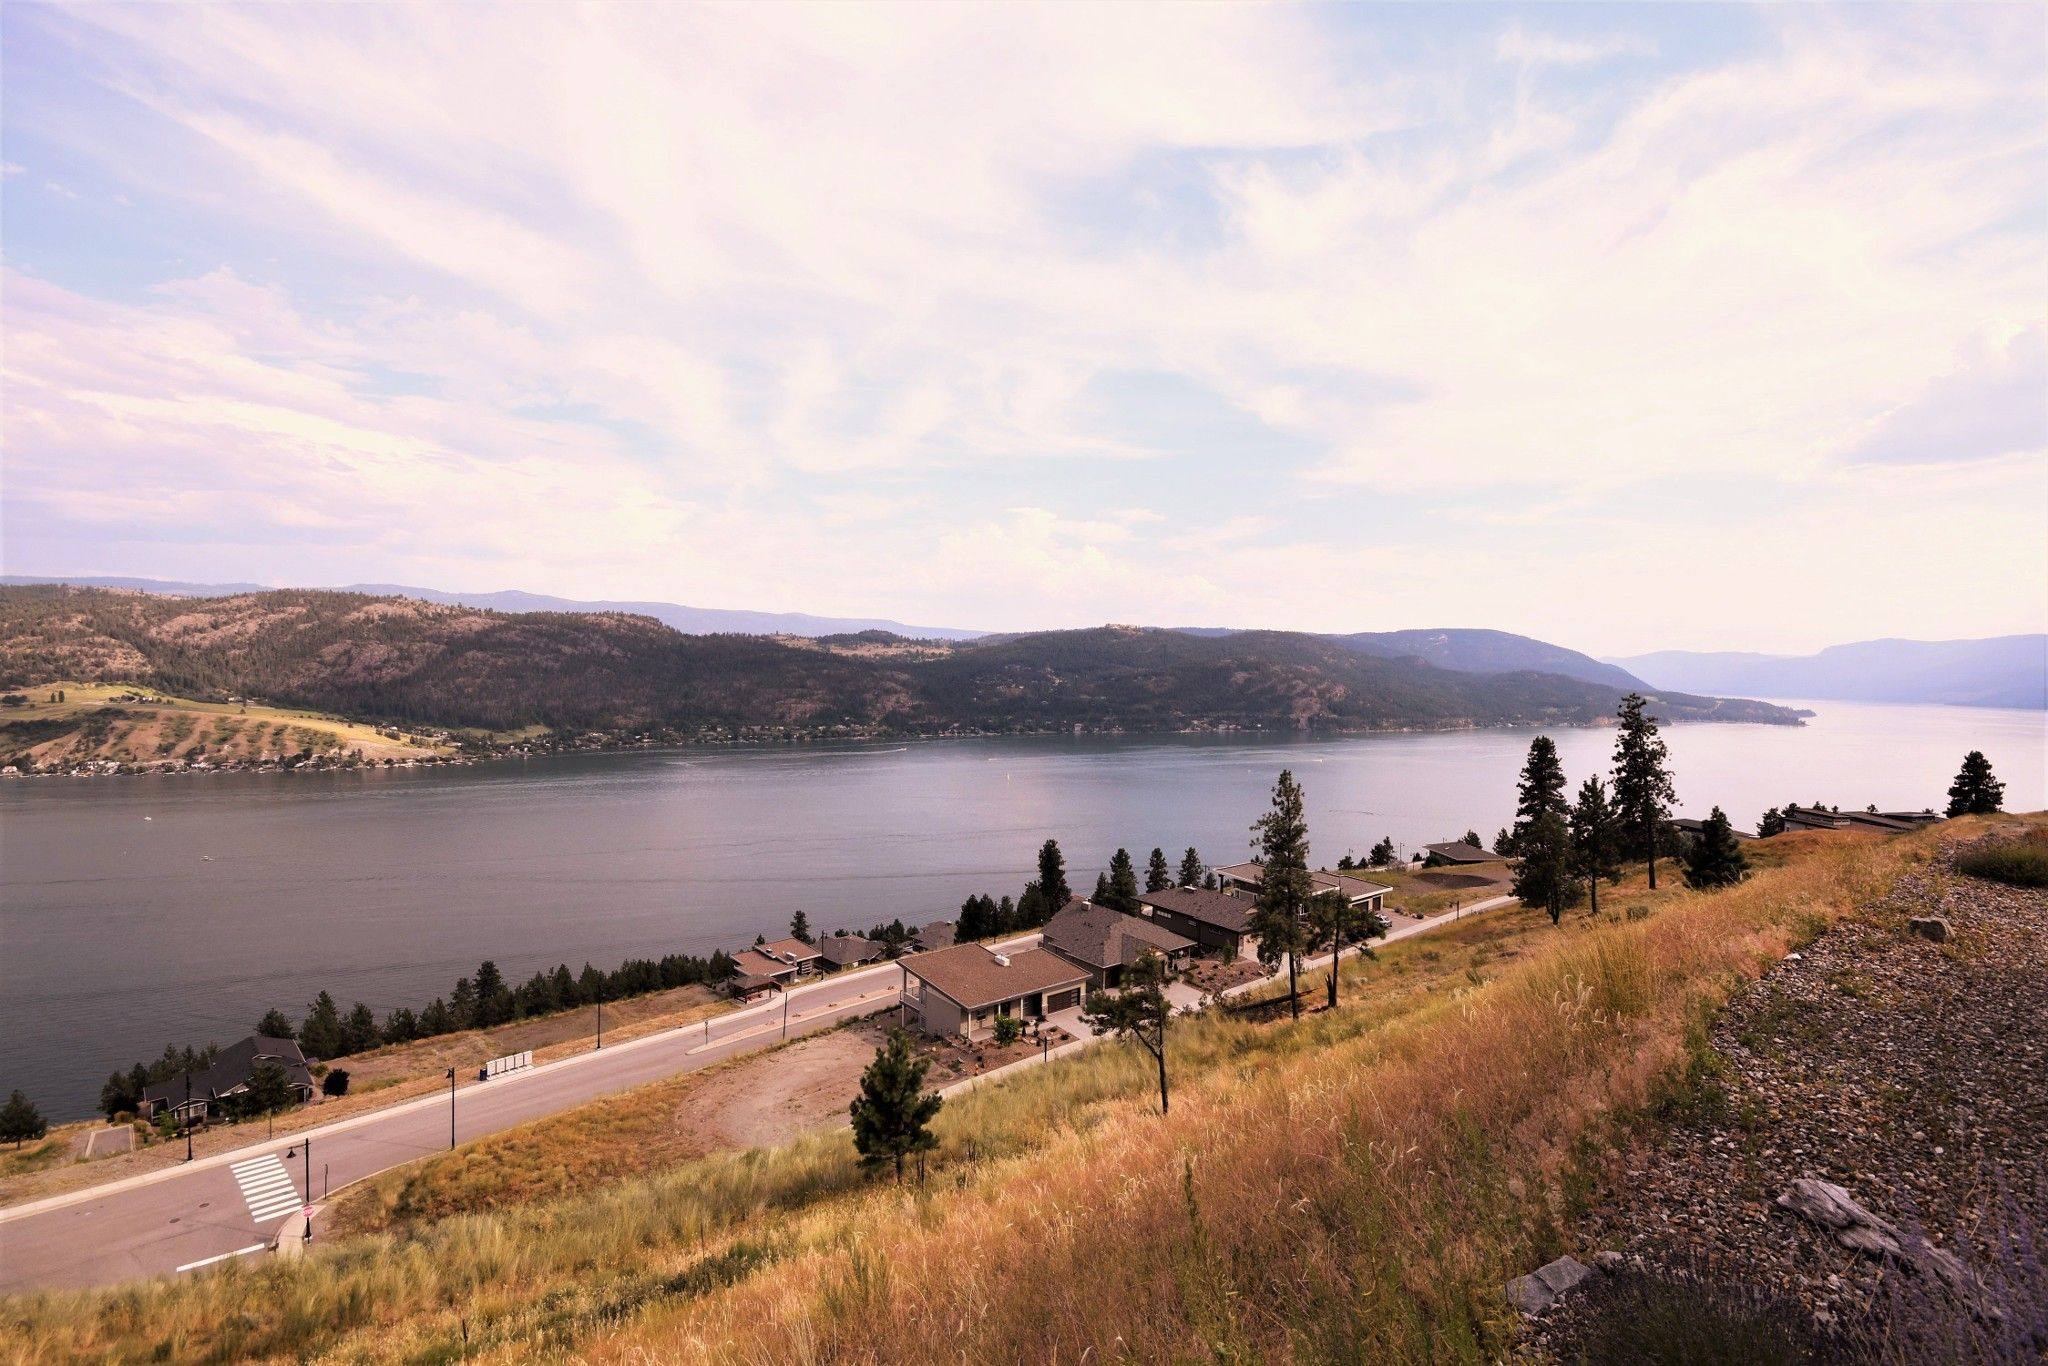 Main Photo: 8880 Hampshire Crescent in Vernon: Adventure Bay Vacant Land for sale (North Okanagan)  : MLS®# 10199386